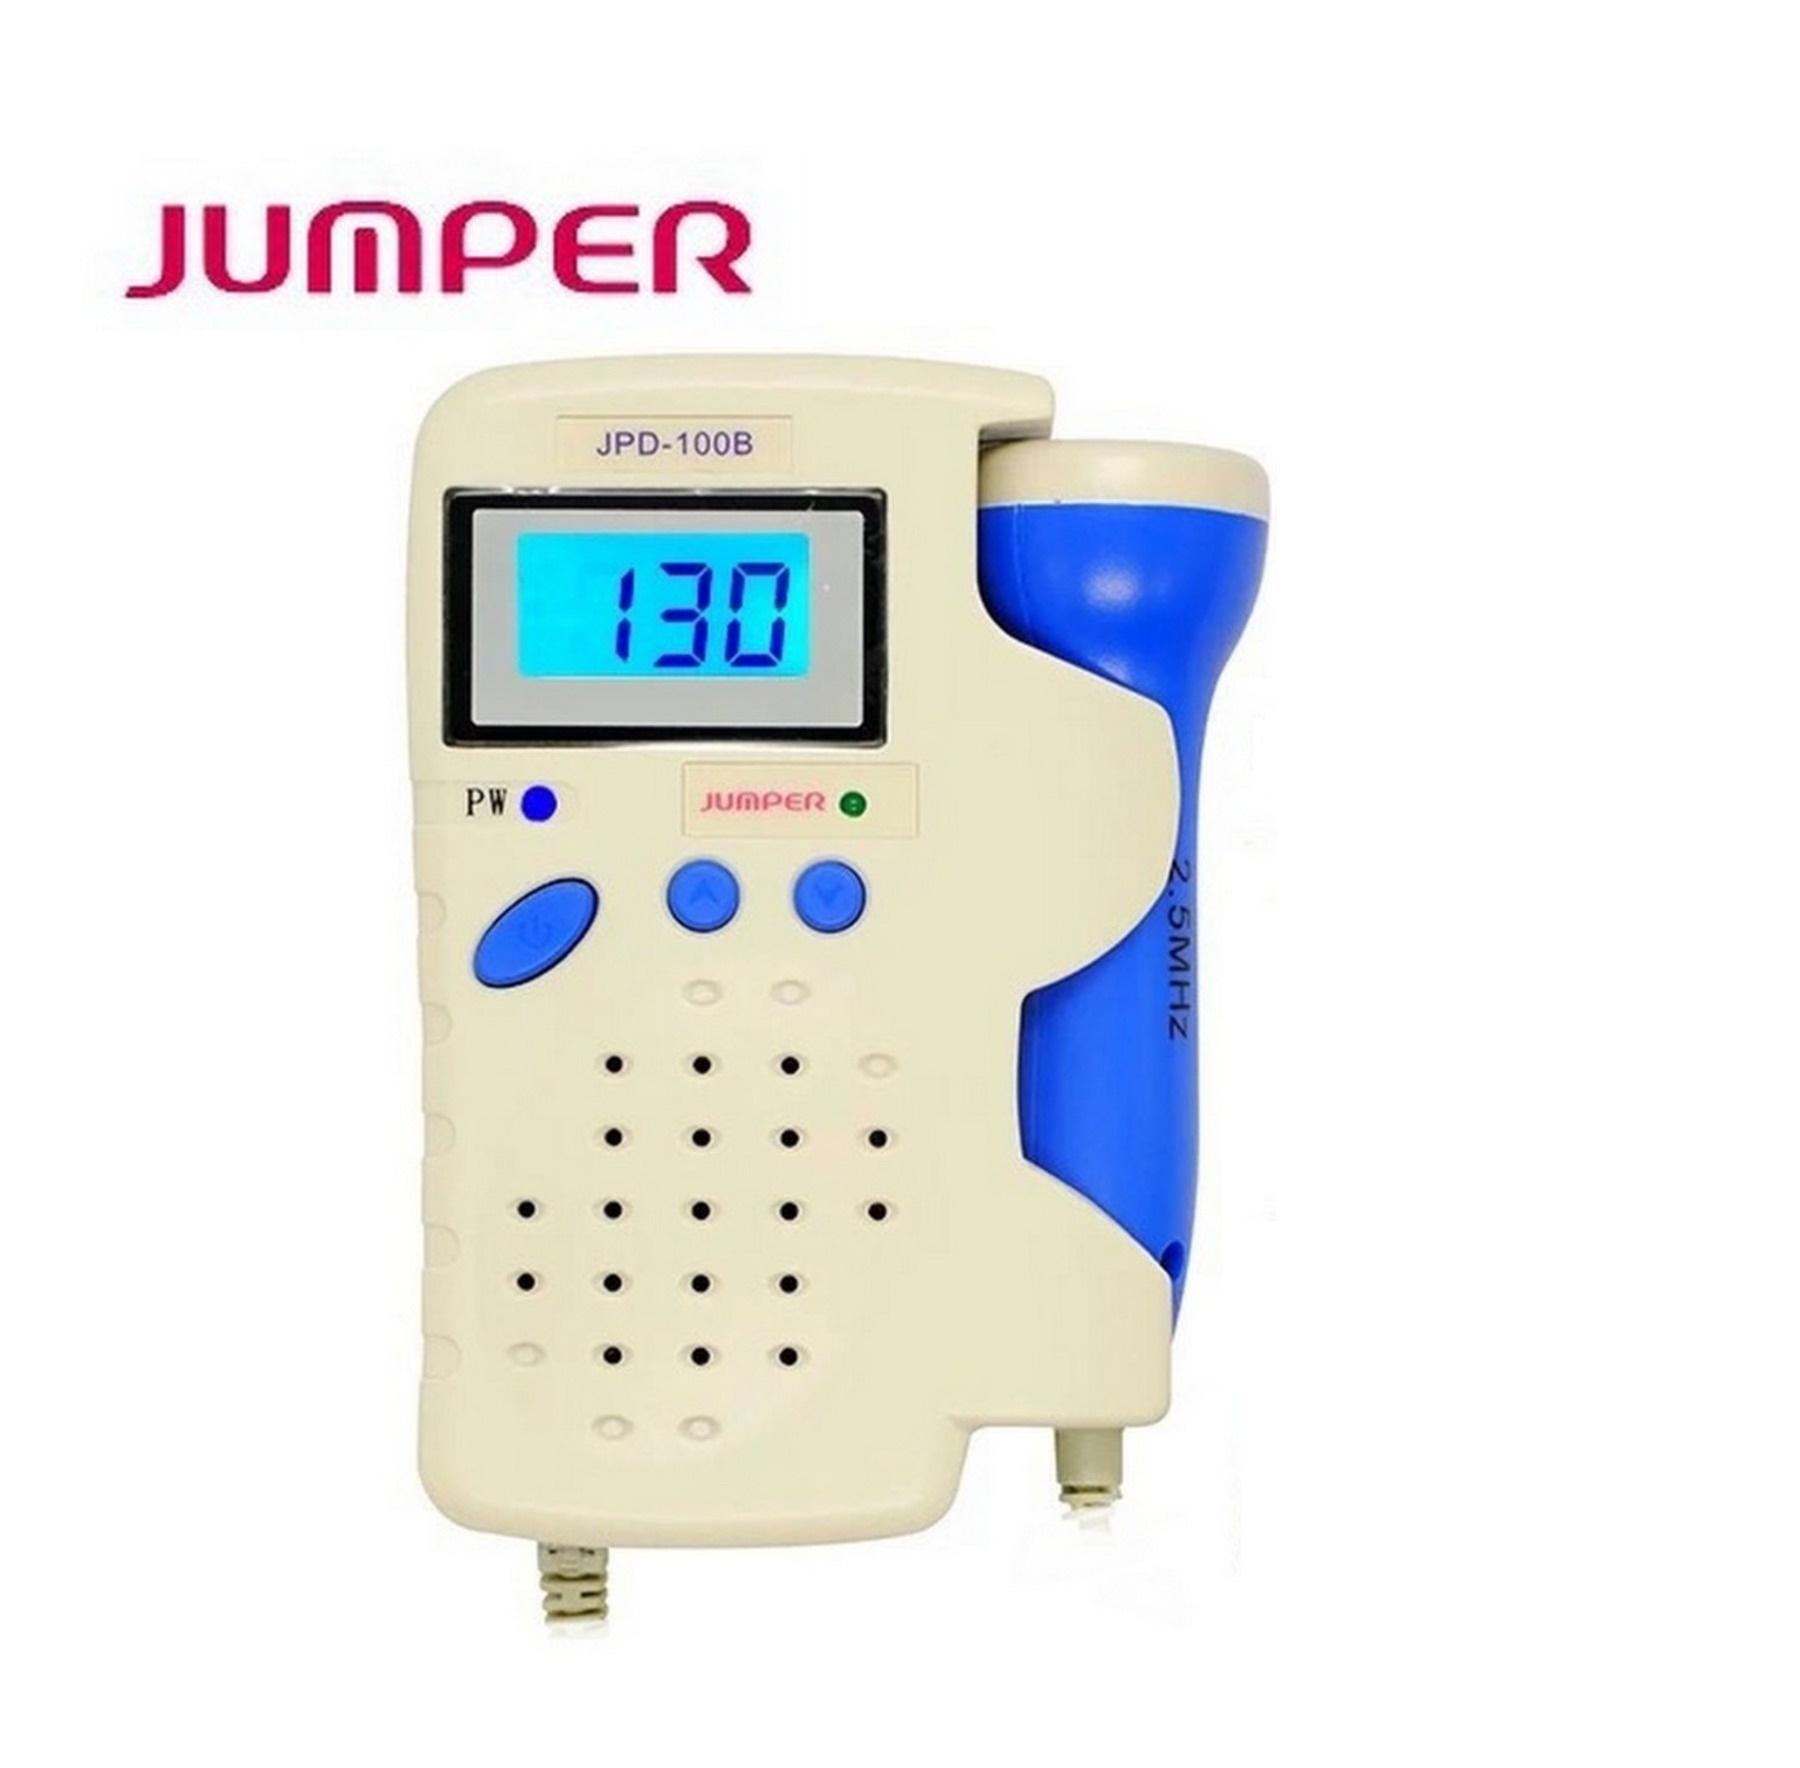 Допплер персональный <br><b>JPD-100B (2)</b>